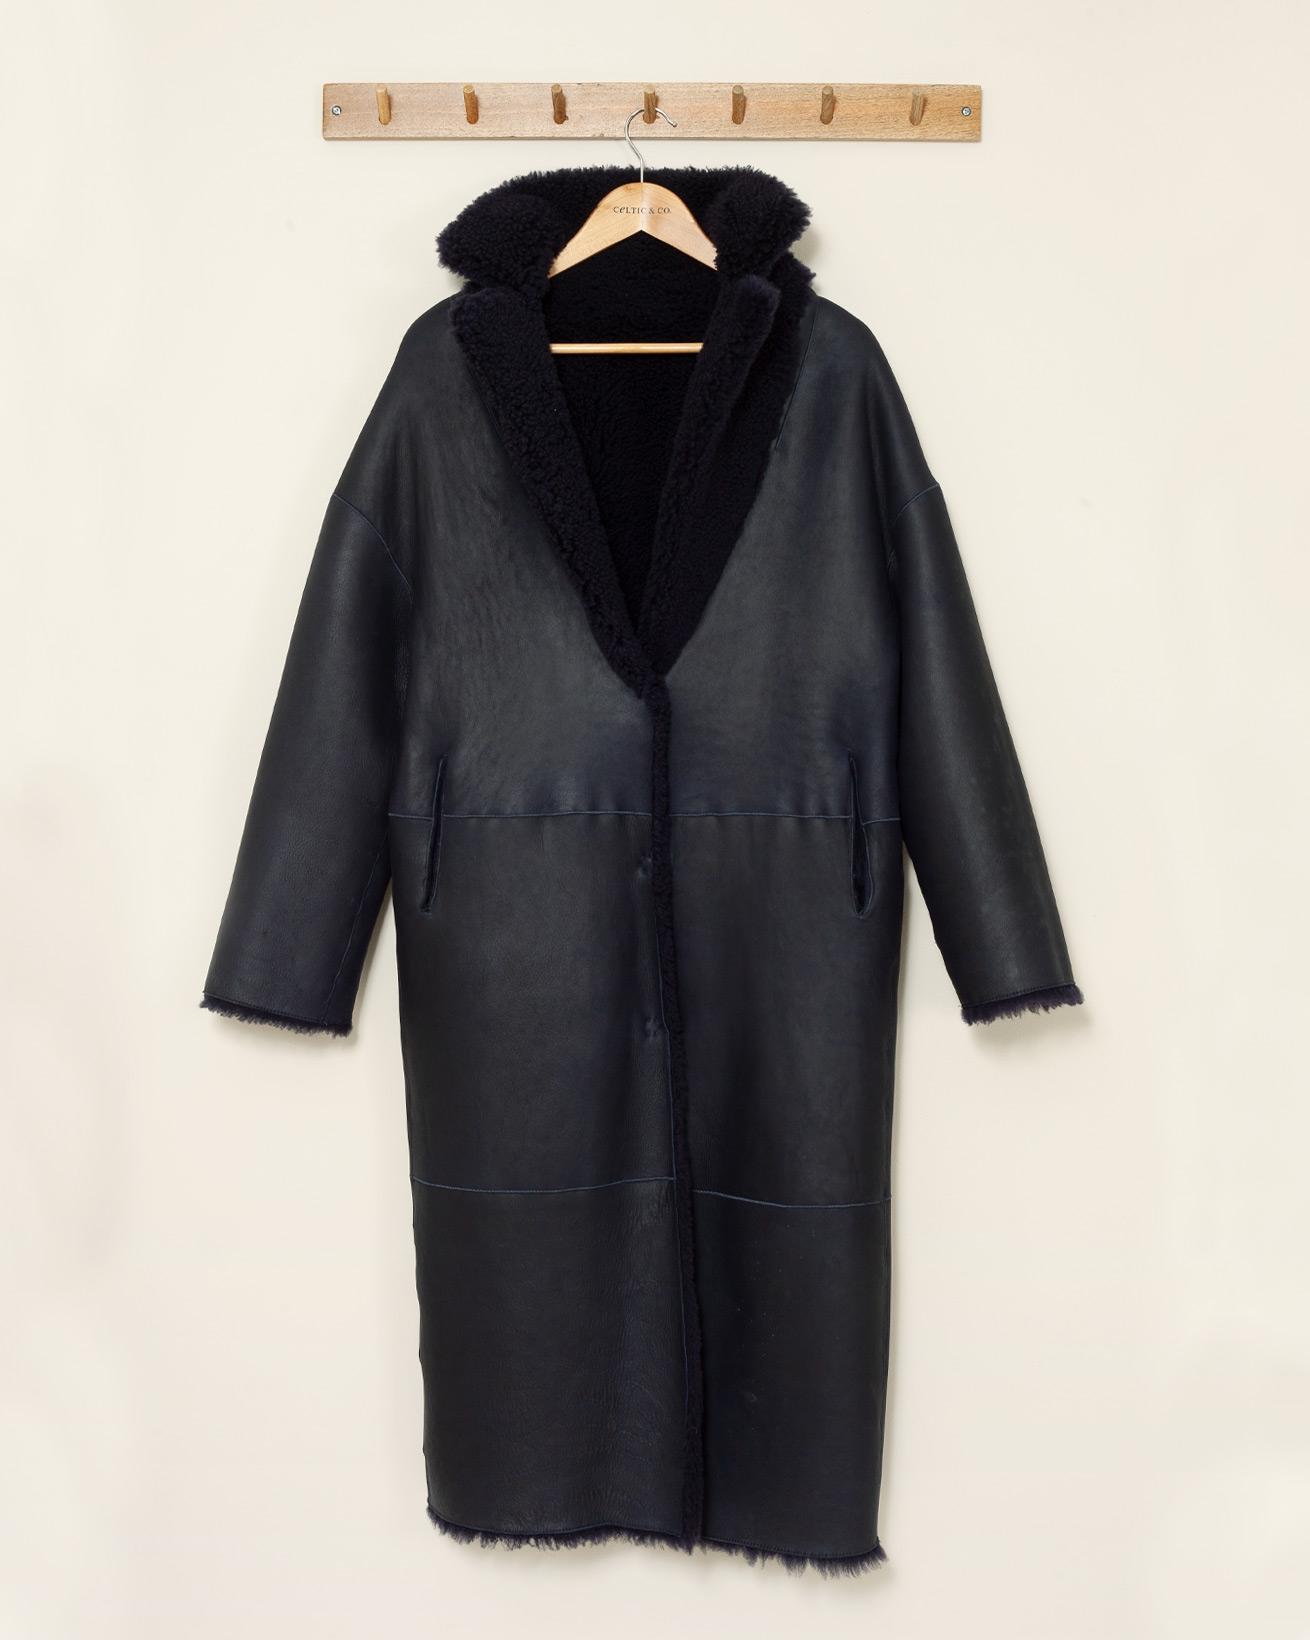 Reversible Long Teddy Coat - Small - Navy - 1125